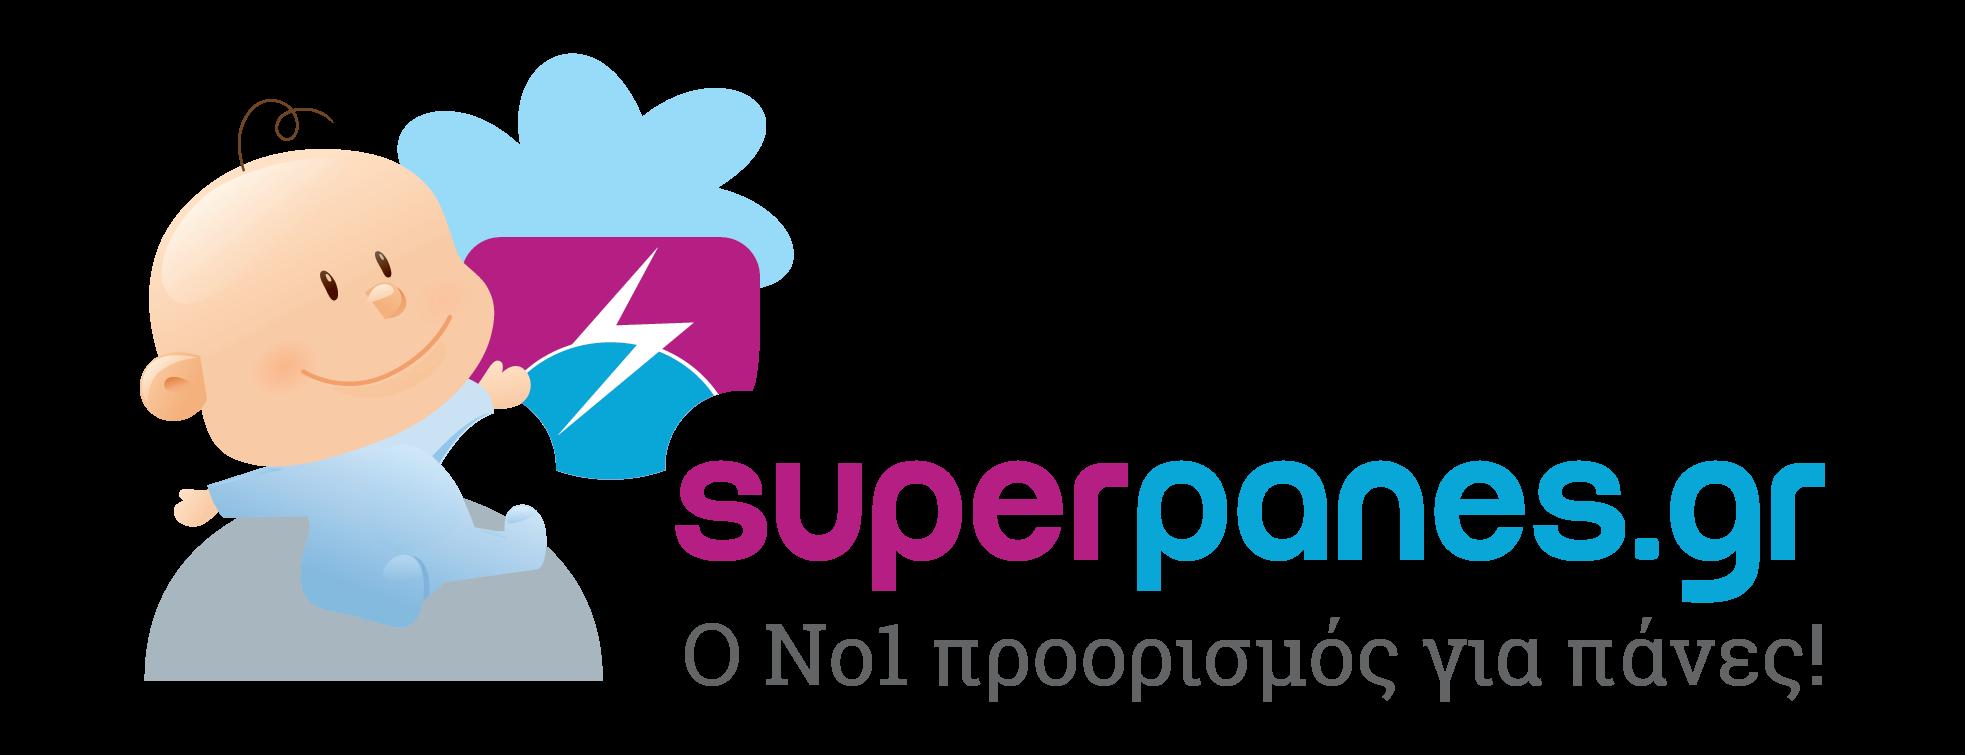 superpanes